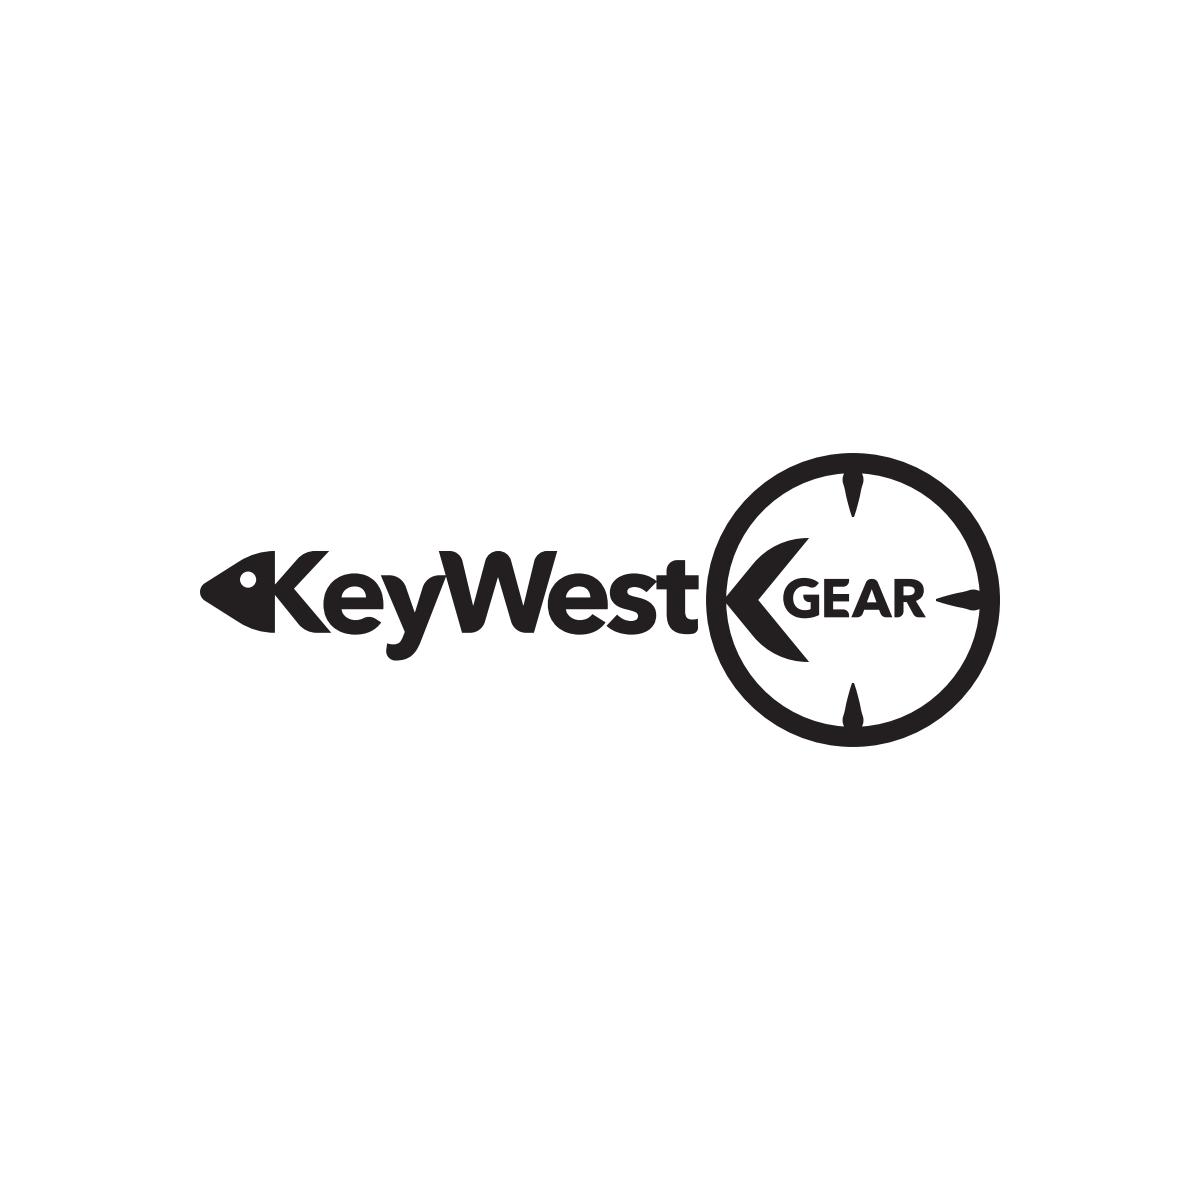 Create Design for Key West gear